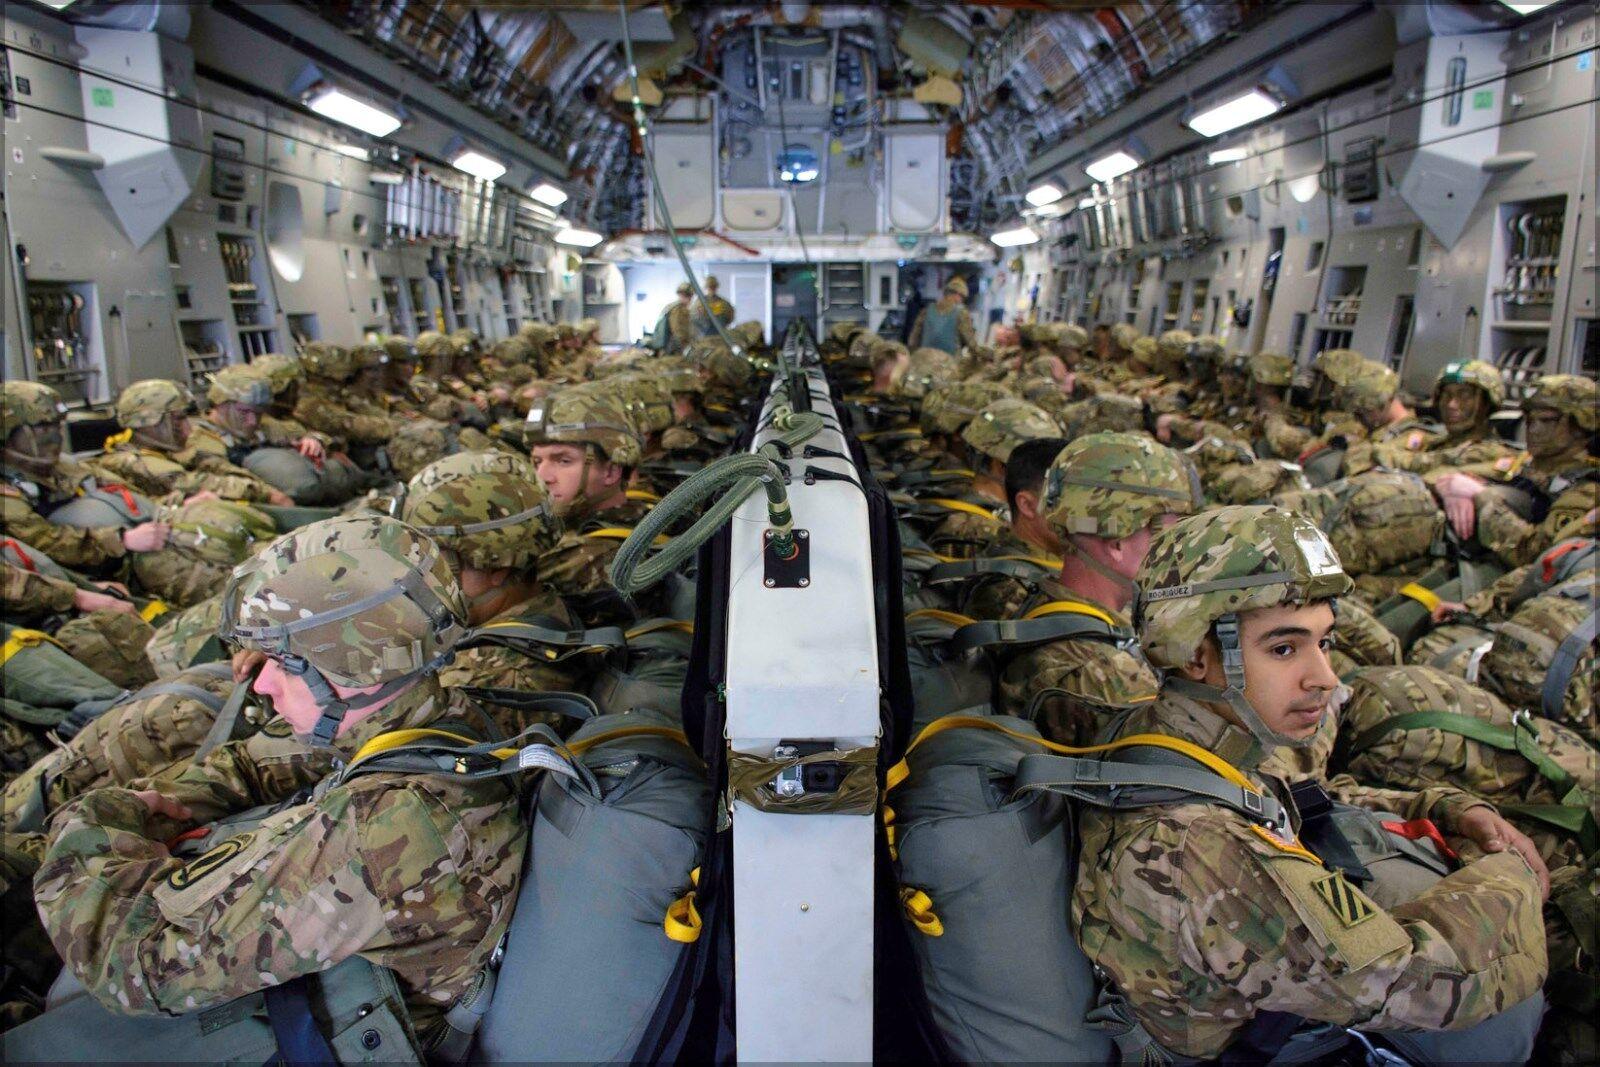 Poster, Many Größes; U.S. Army Airborne Paratroopers Aboard C-17 Globemaster